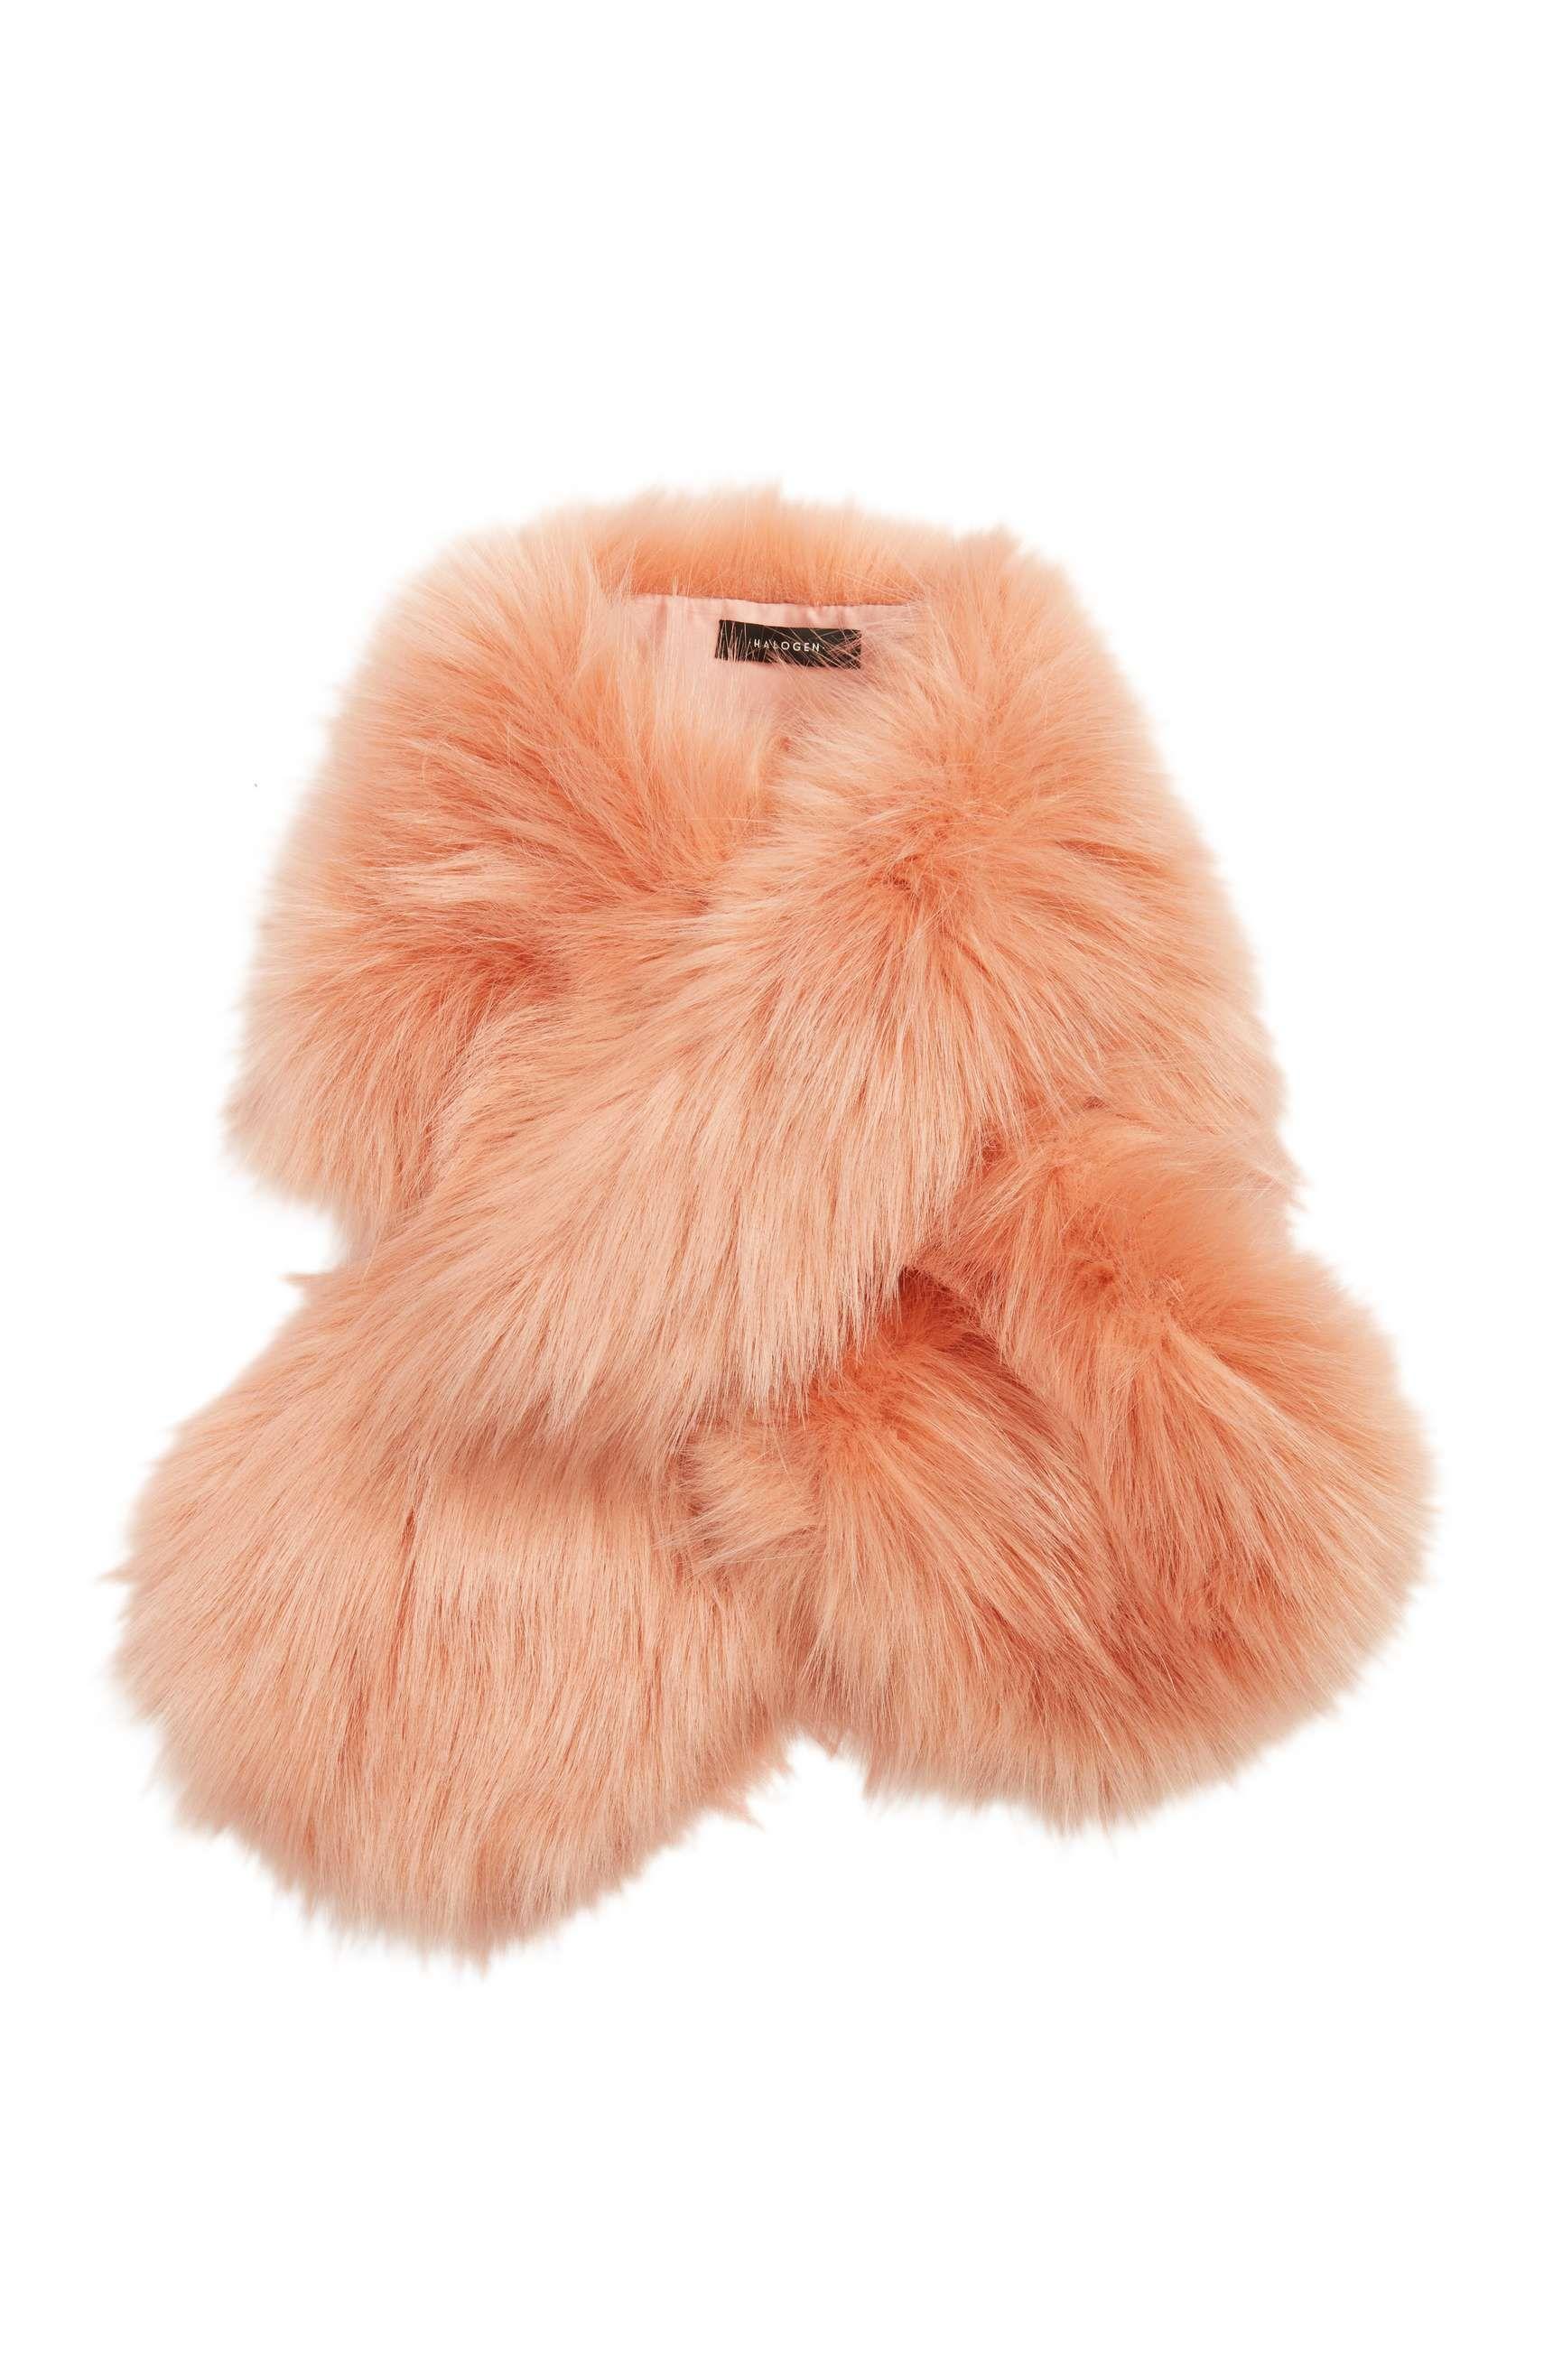 hbz-fur-scarf-1509050032.jpg (980×1501)